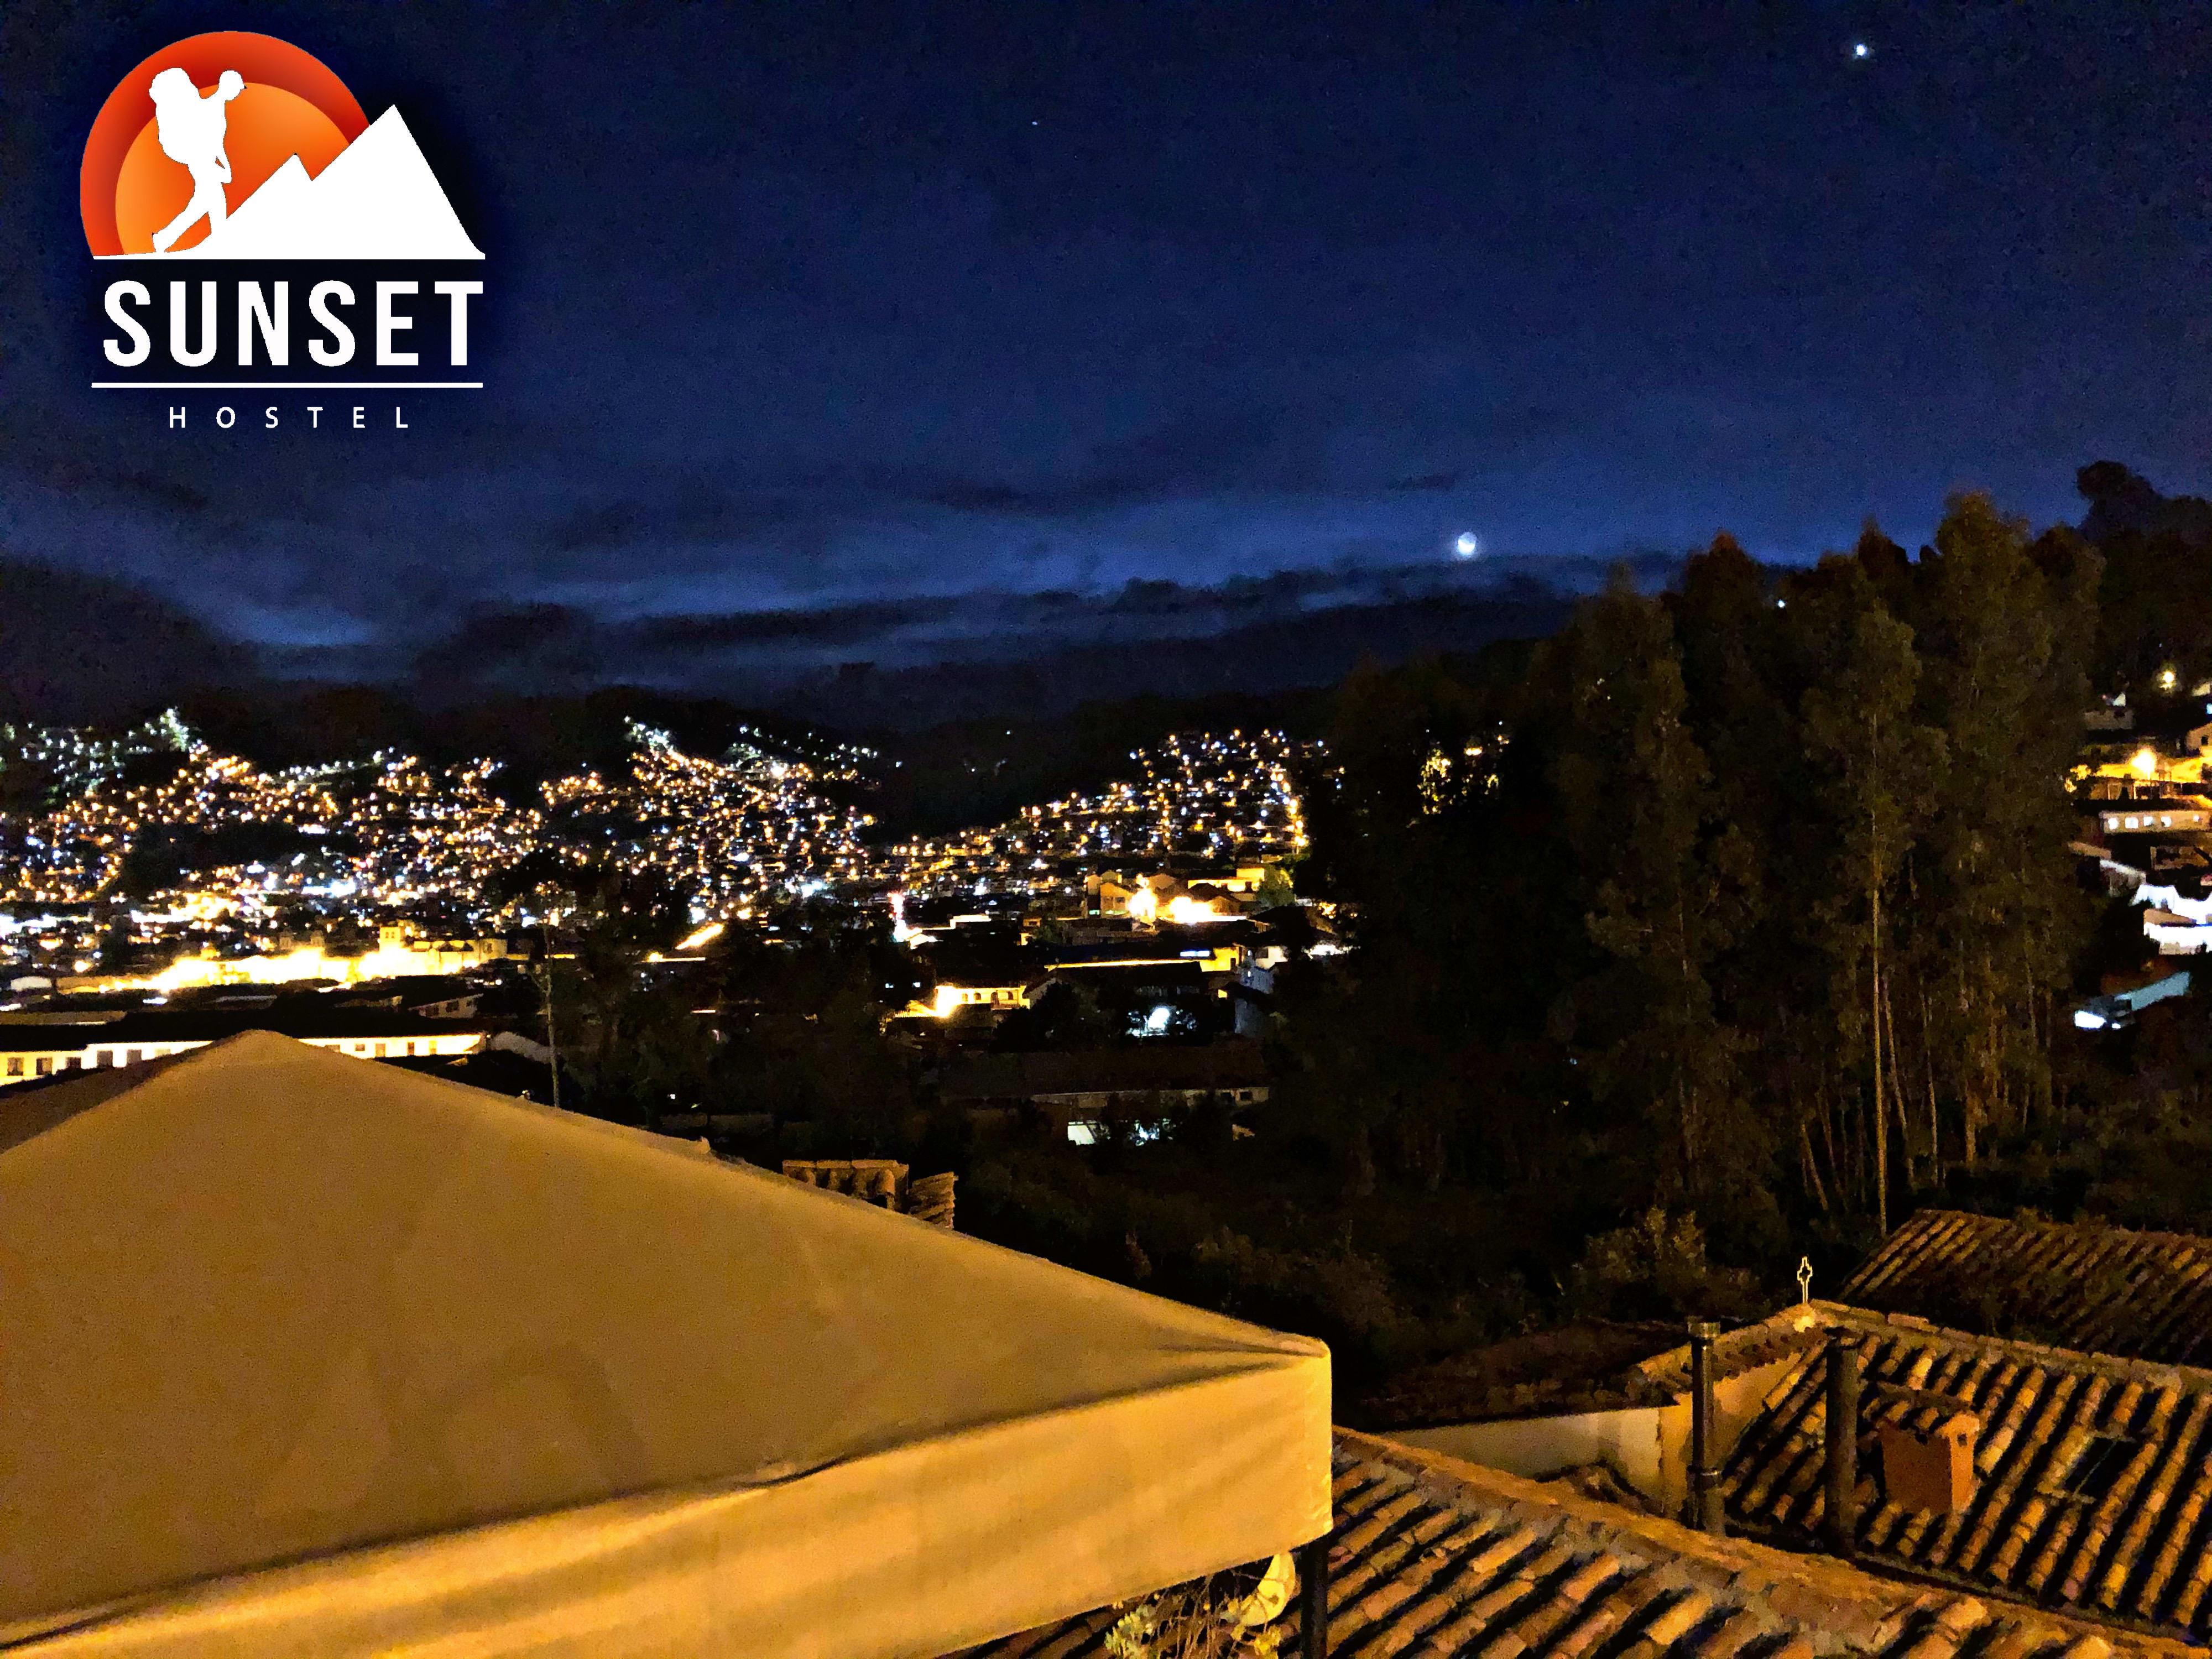 HOSTEL - Sunset House Hostel